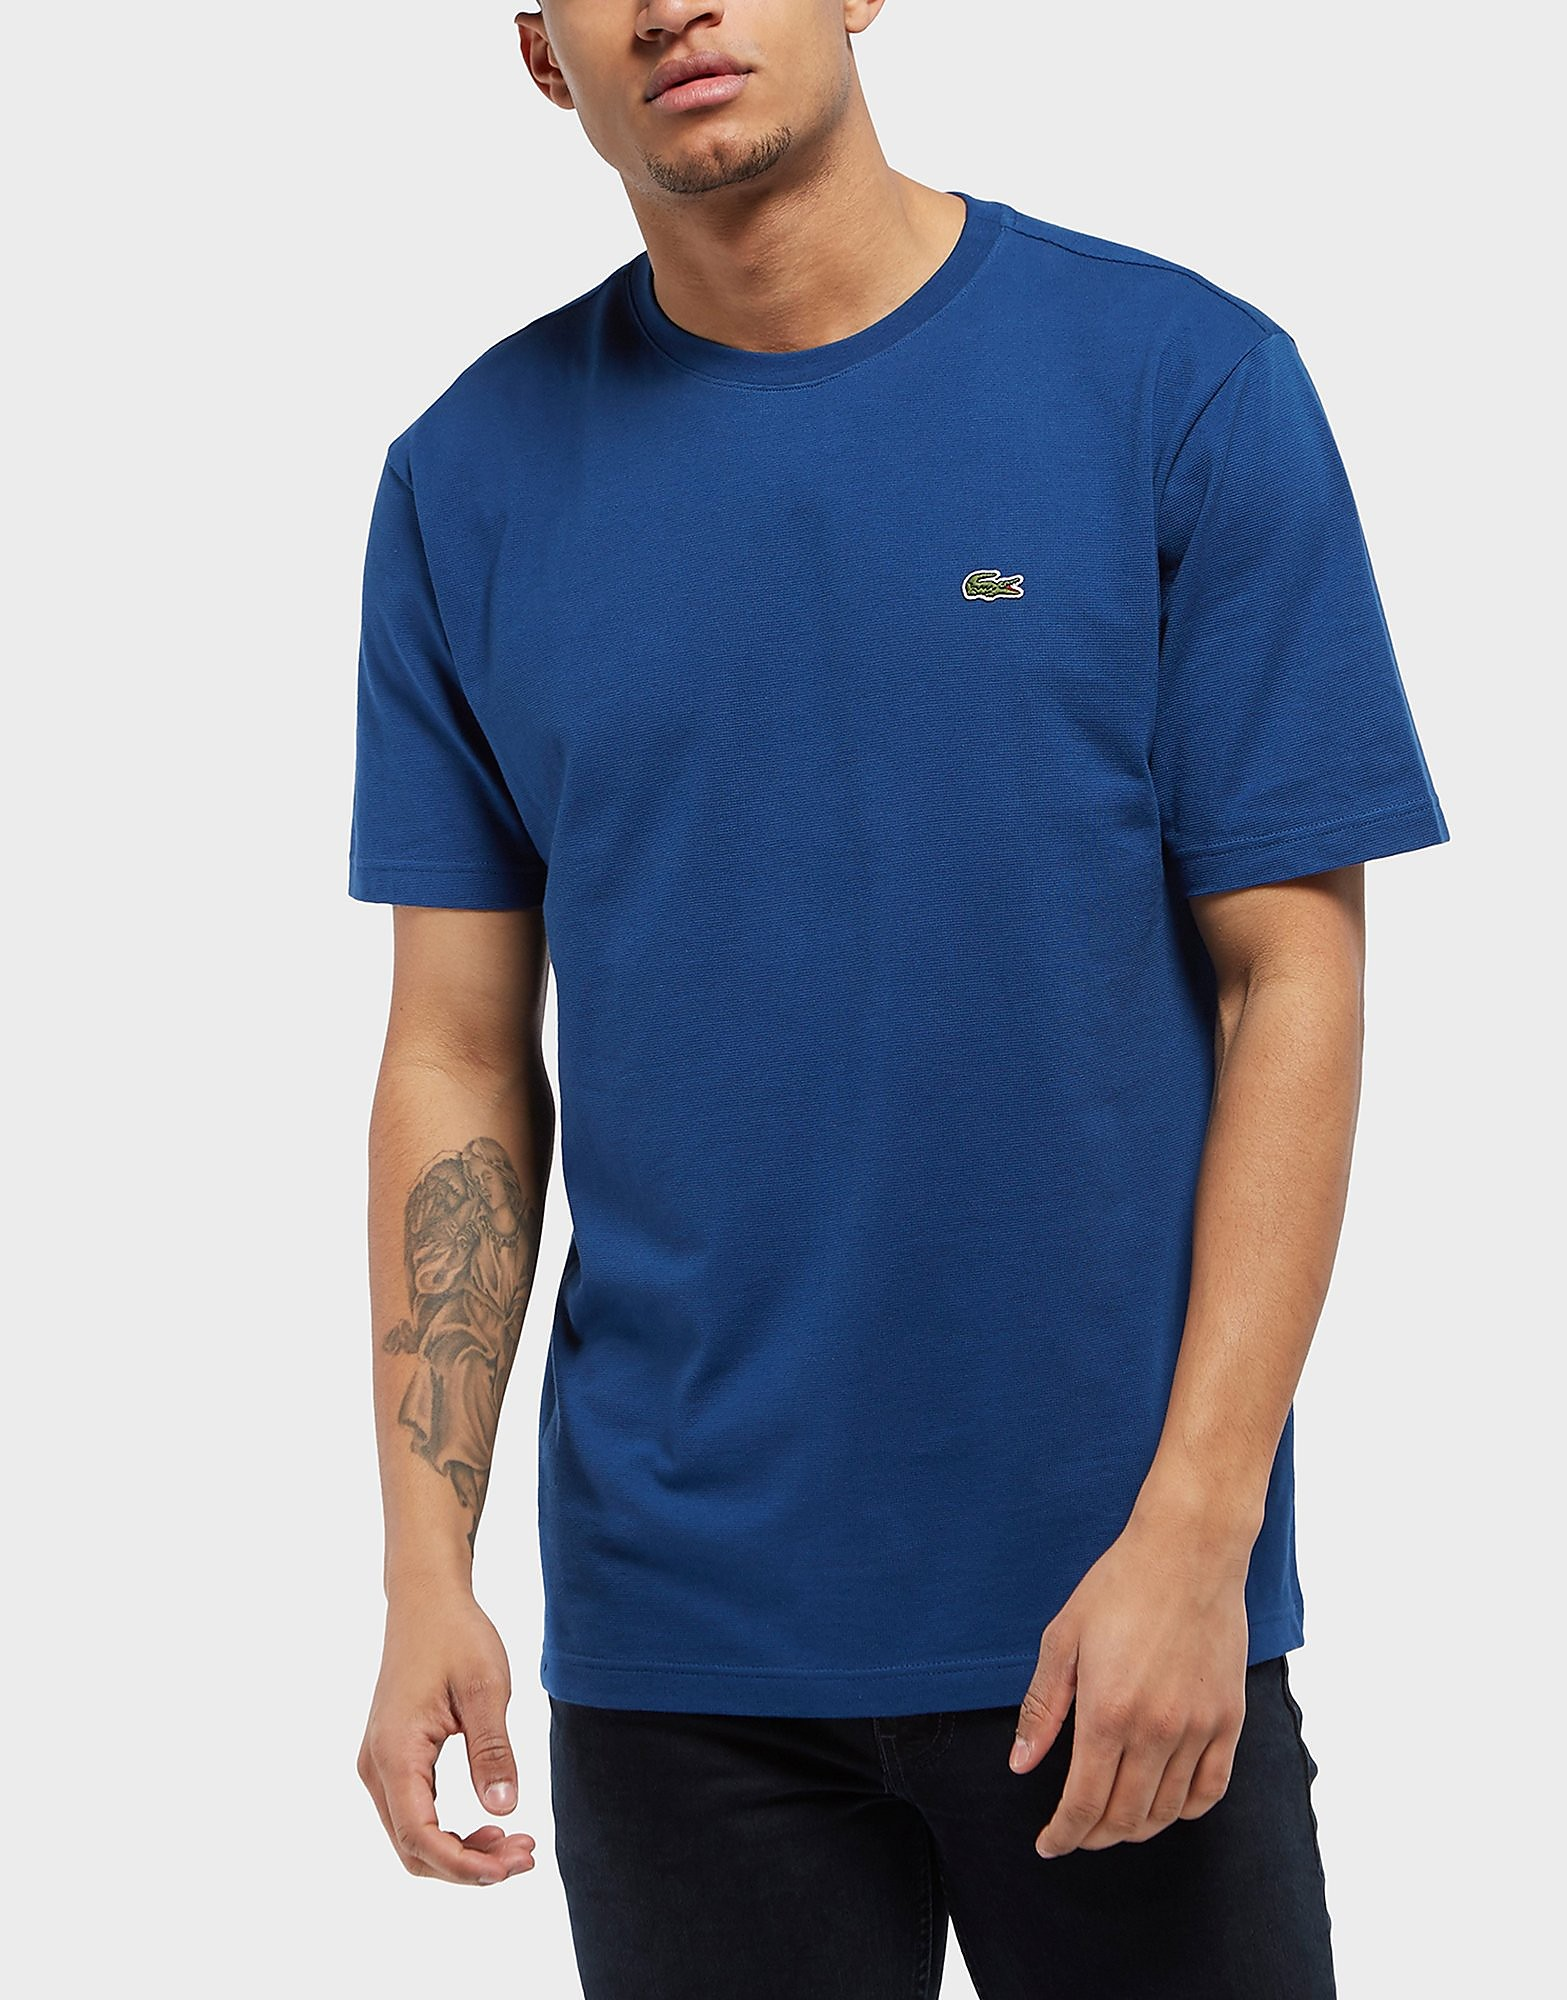 Lacoste Alligator Crew Short Sleeve T-Shirt